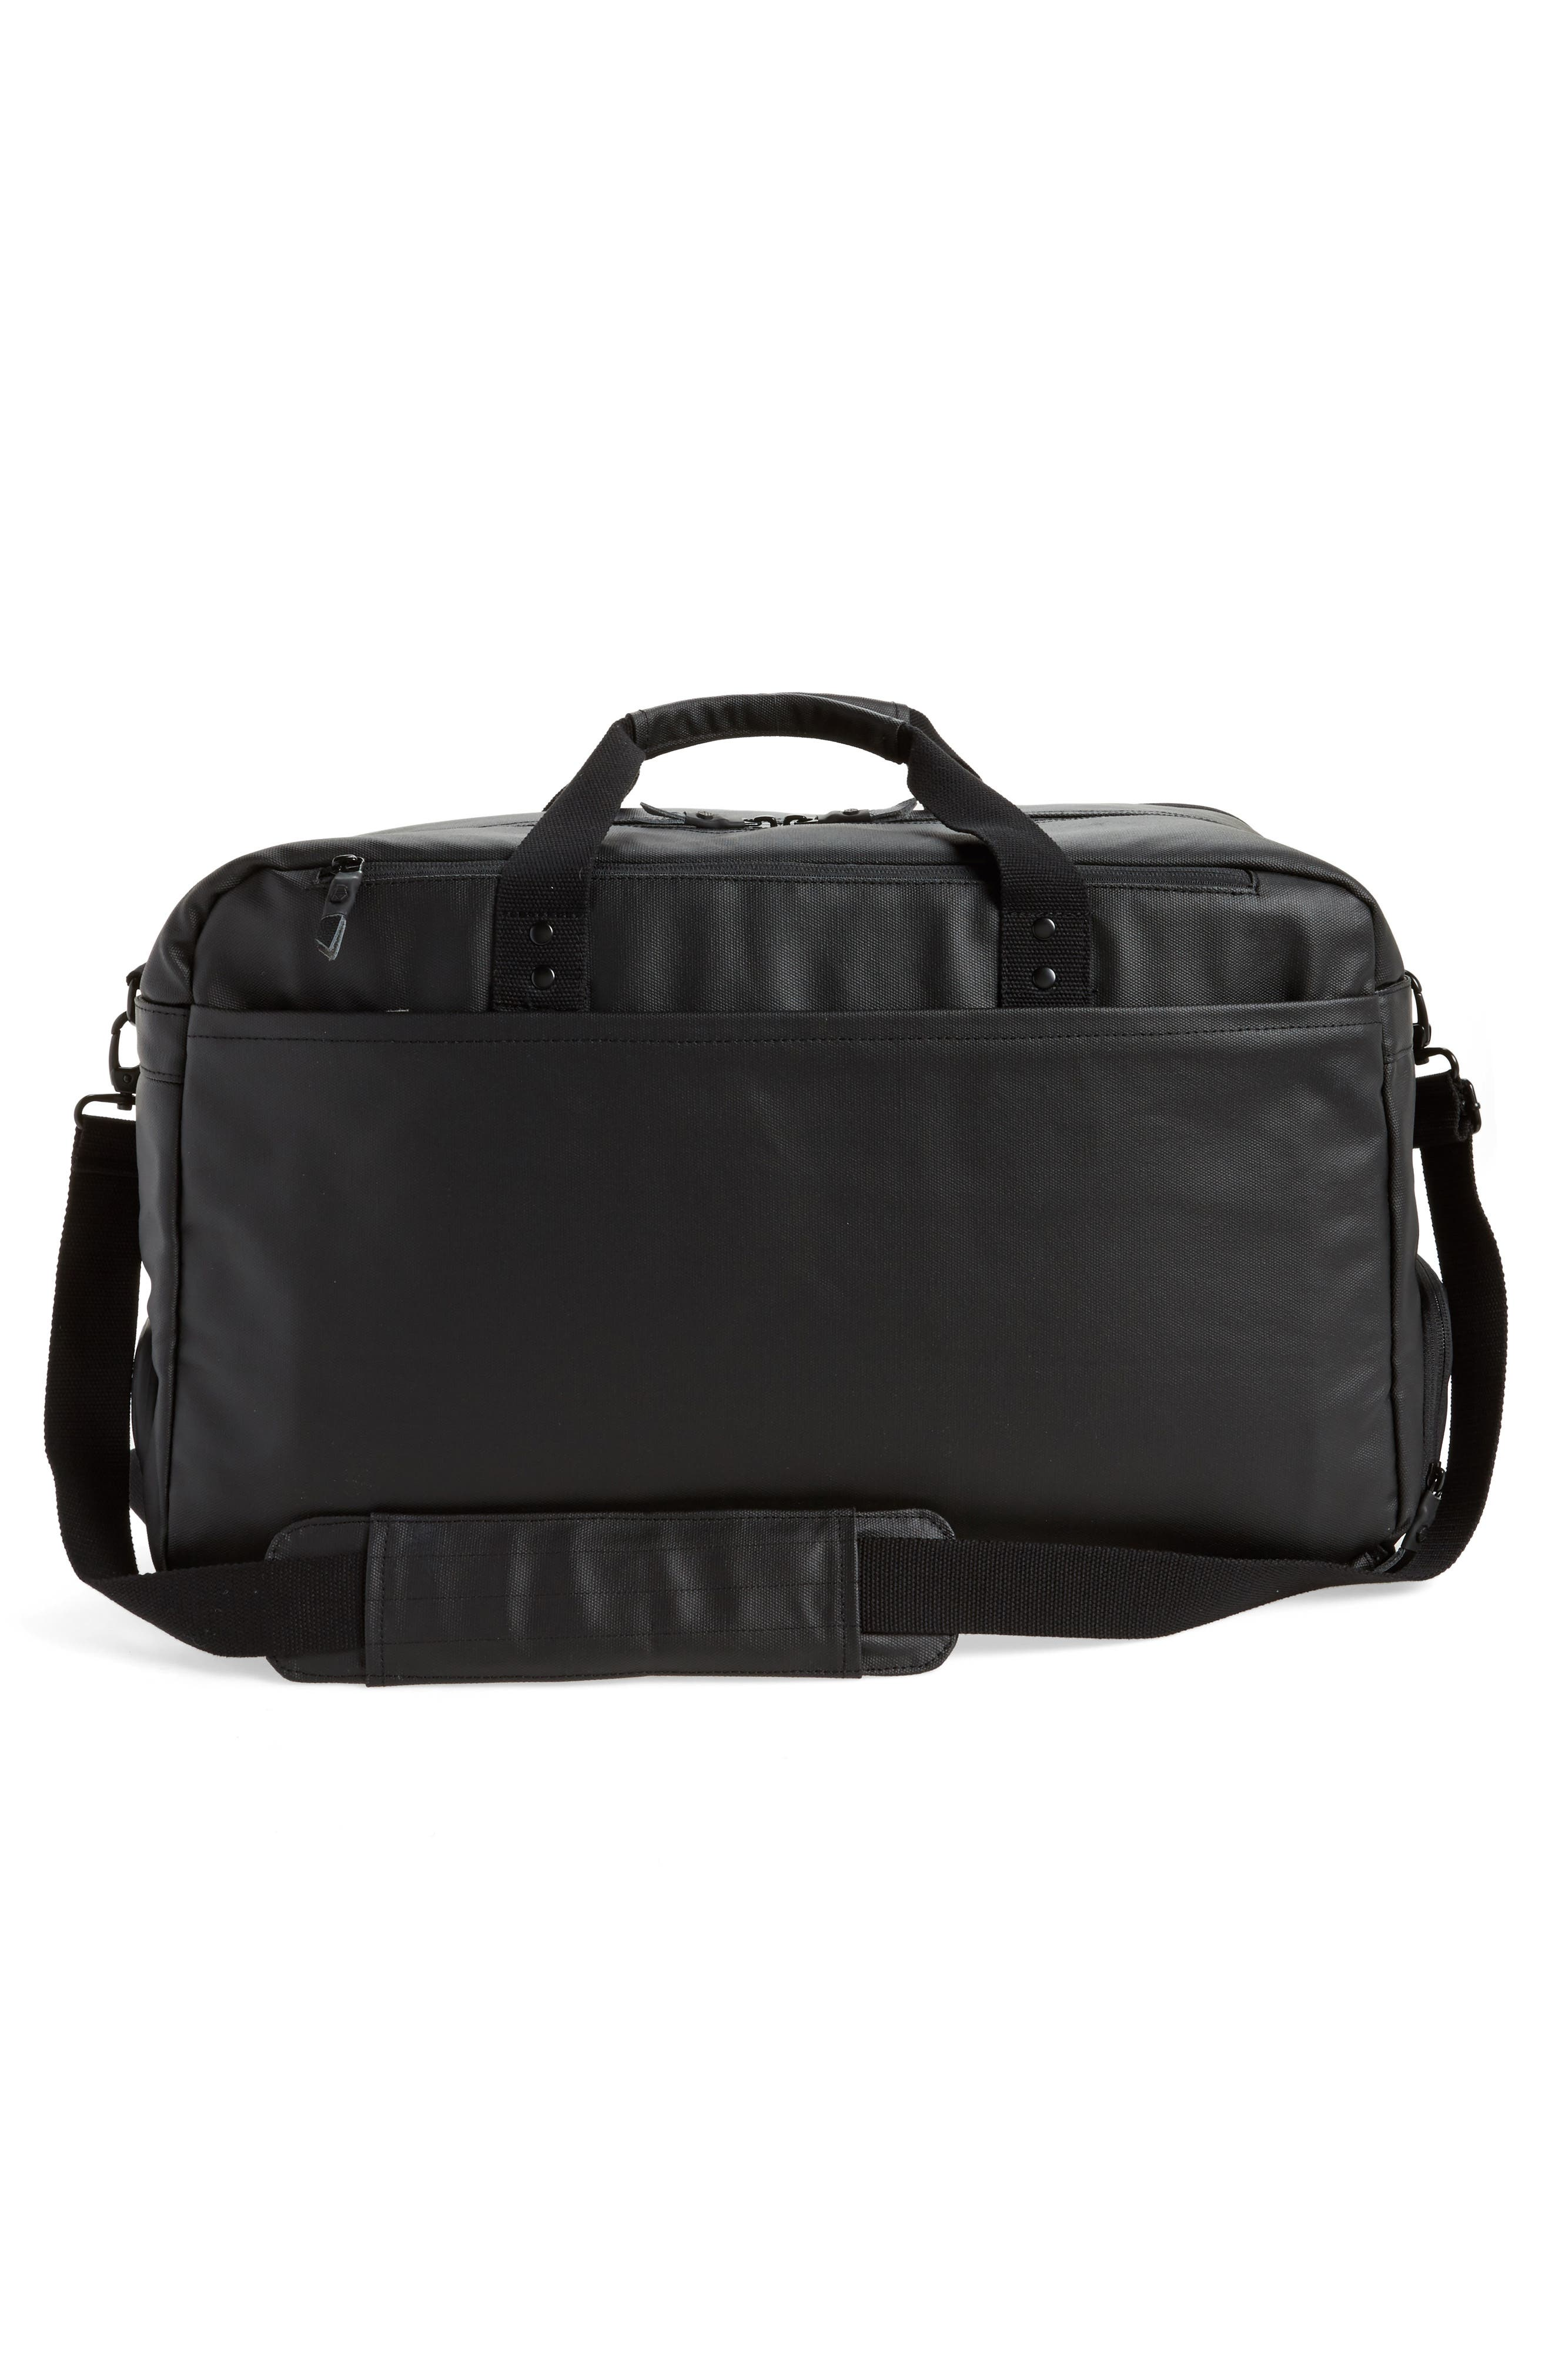 Convertible Duffel Bag,                             Alternate thumbnail 3, color,                             001